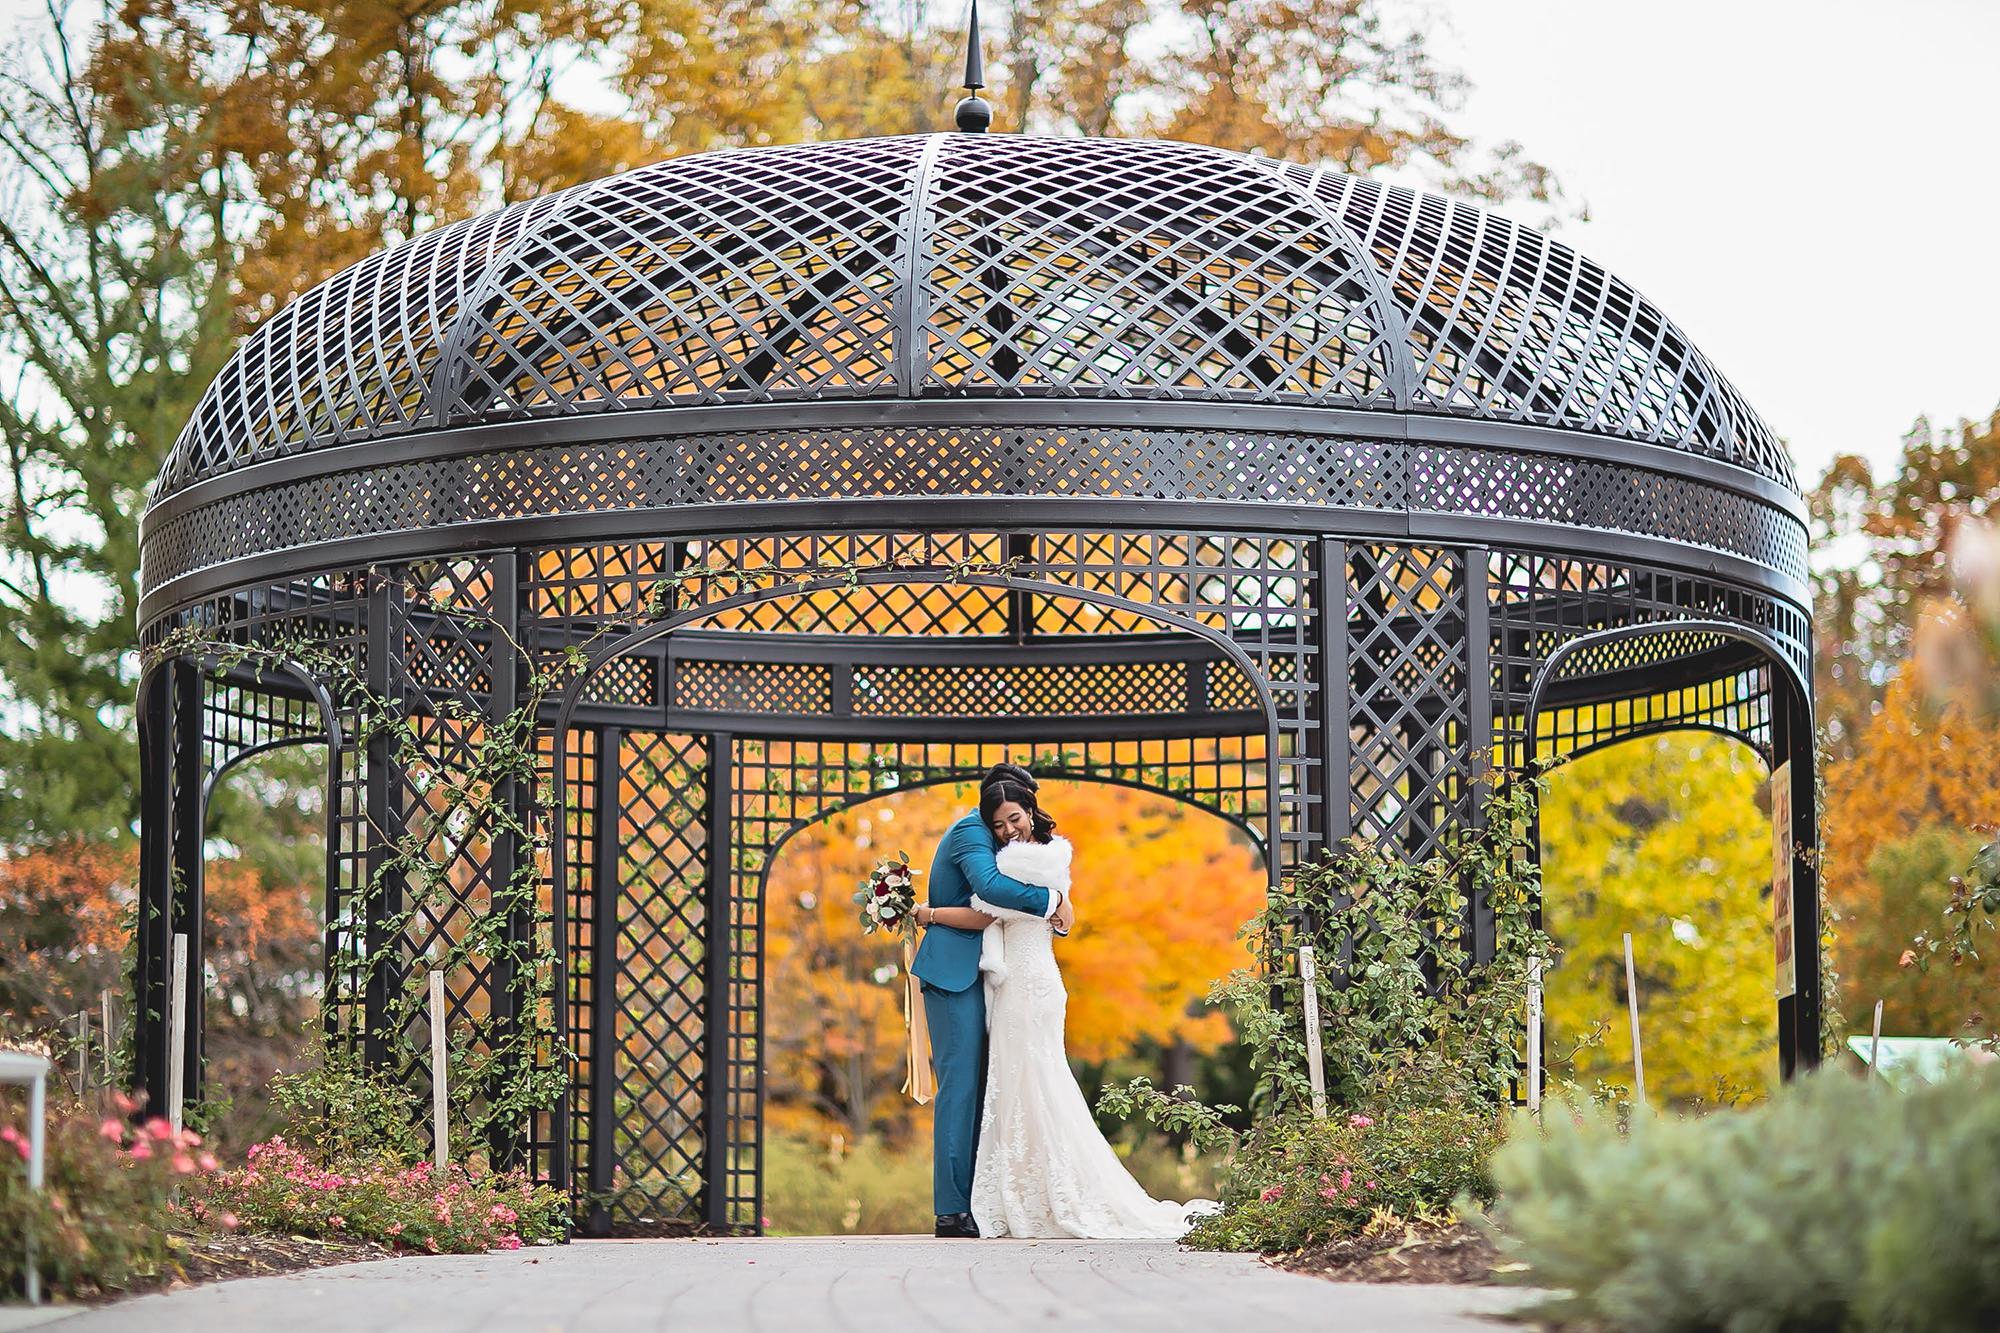 Wedding bride and groom in Hendrie Park gazebo credit ESM Photography - Royal Botanical Gardens 680 Plains Road West Burlington On Canada